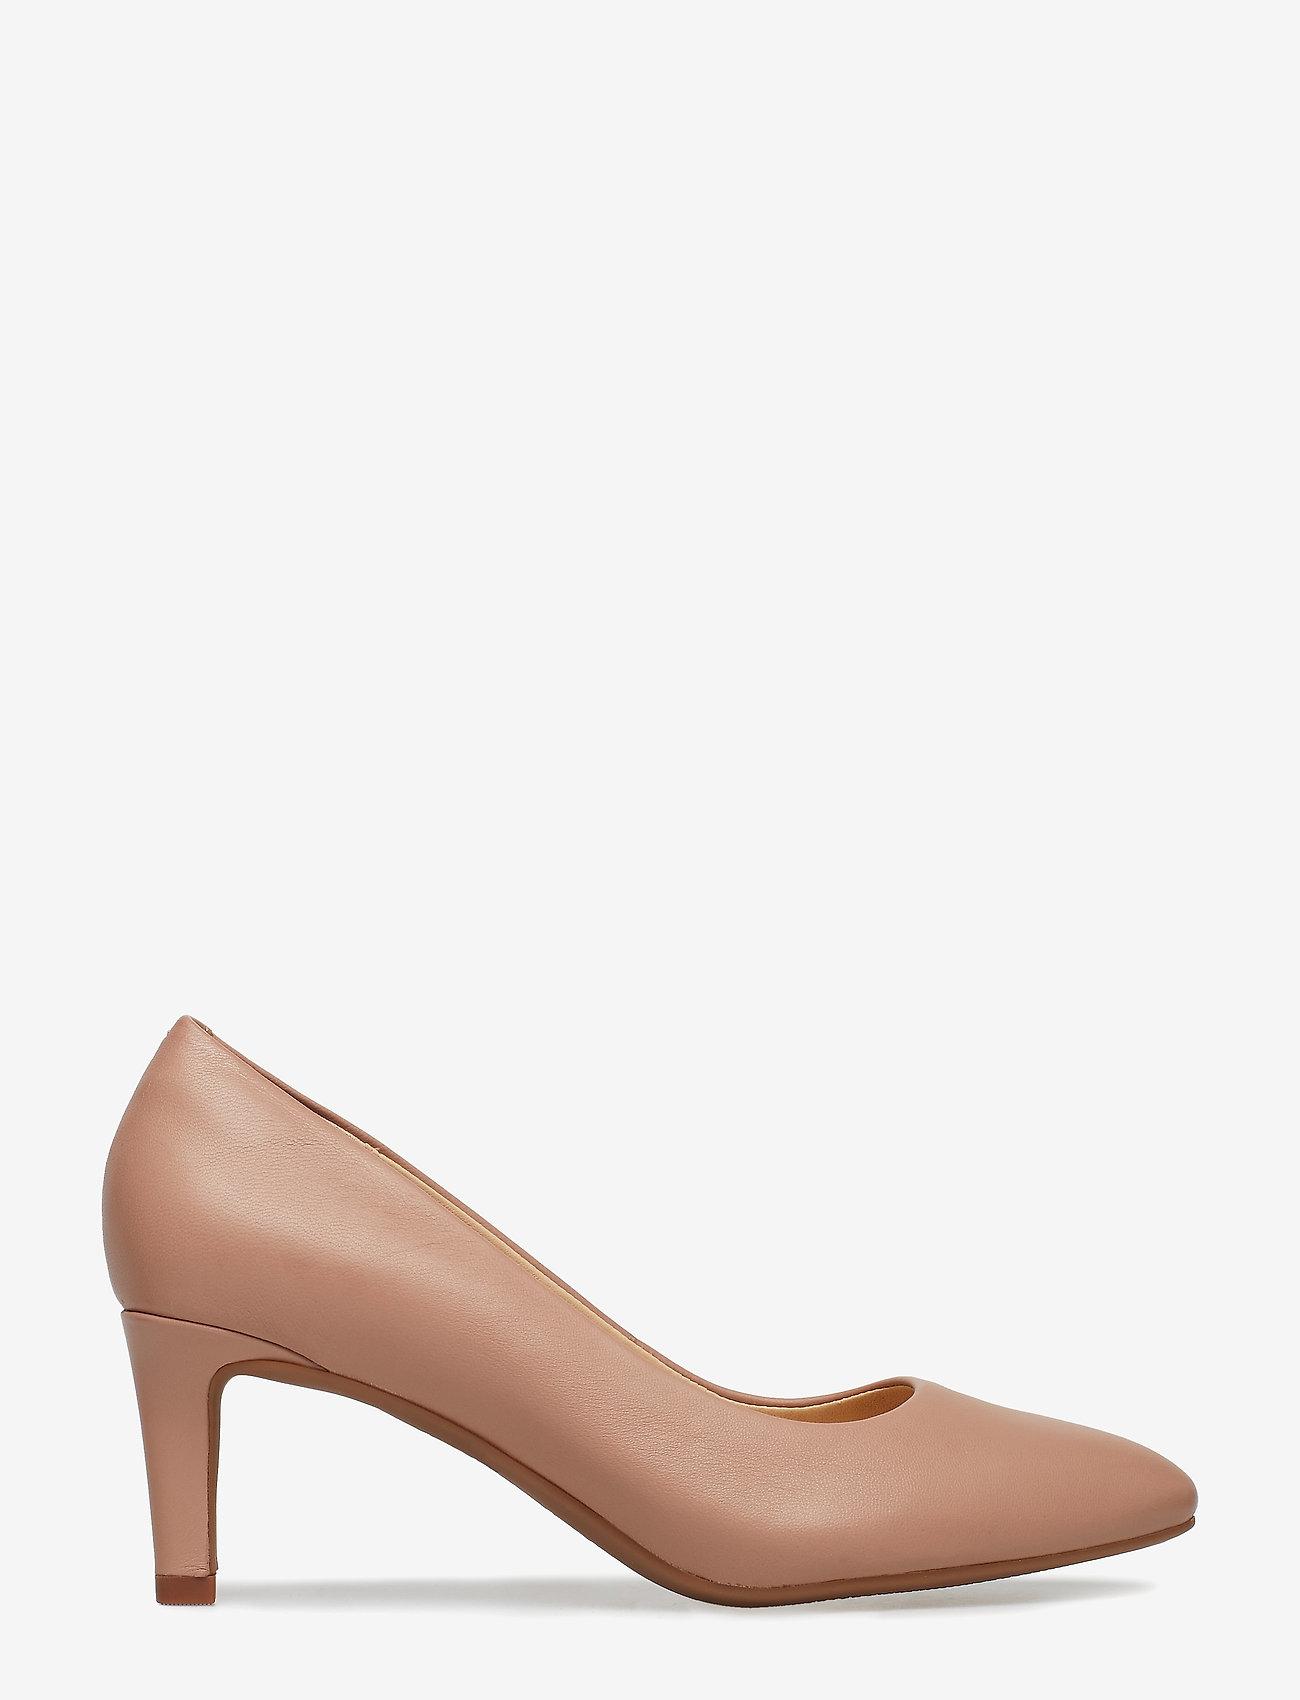 Clarks - Calla Rose - escarpins classiques - nude leather - 1